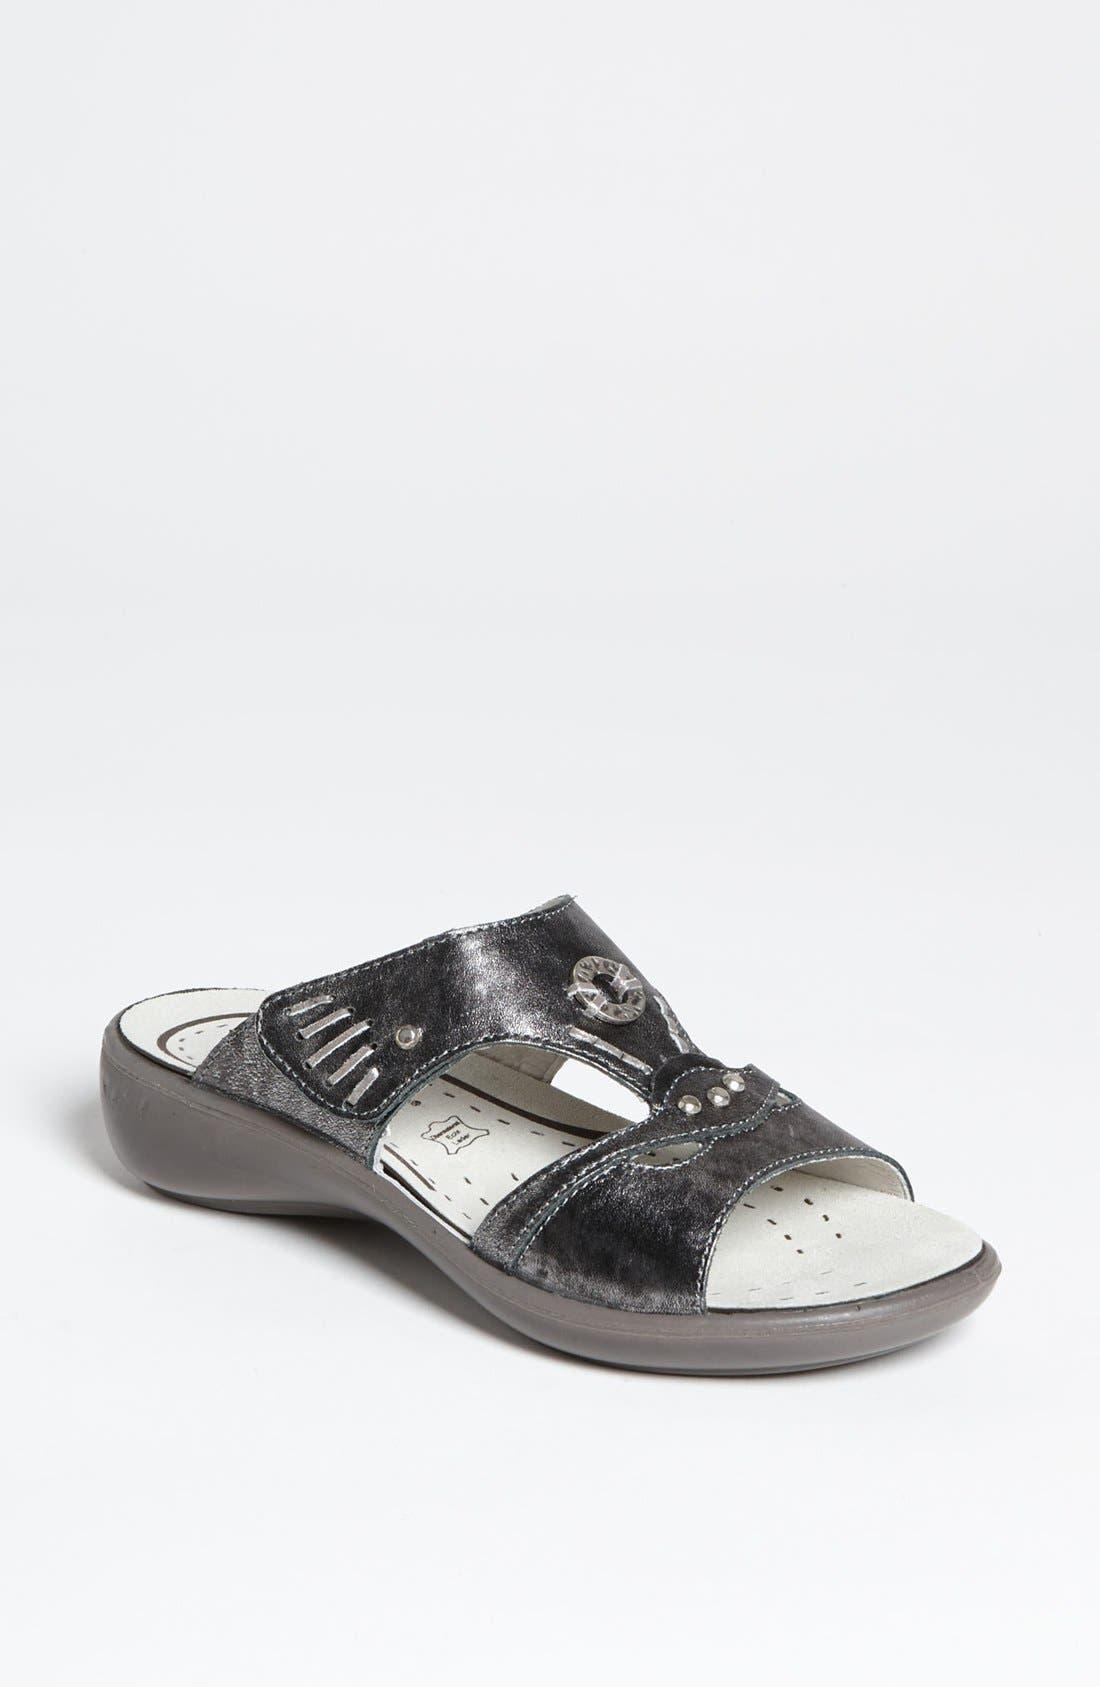 Alternate Image 1 Selected - Romika® 'Ibiza 36' Sandal